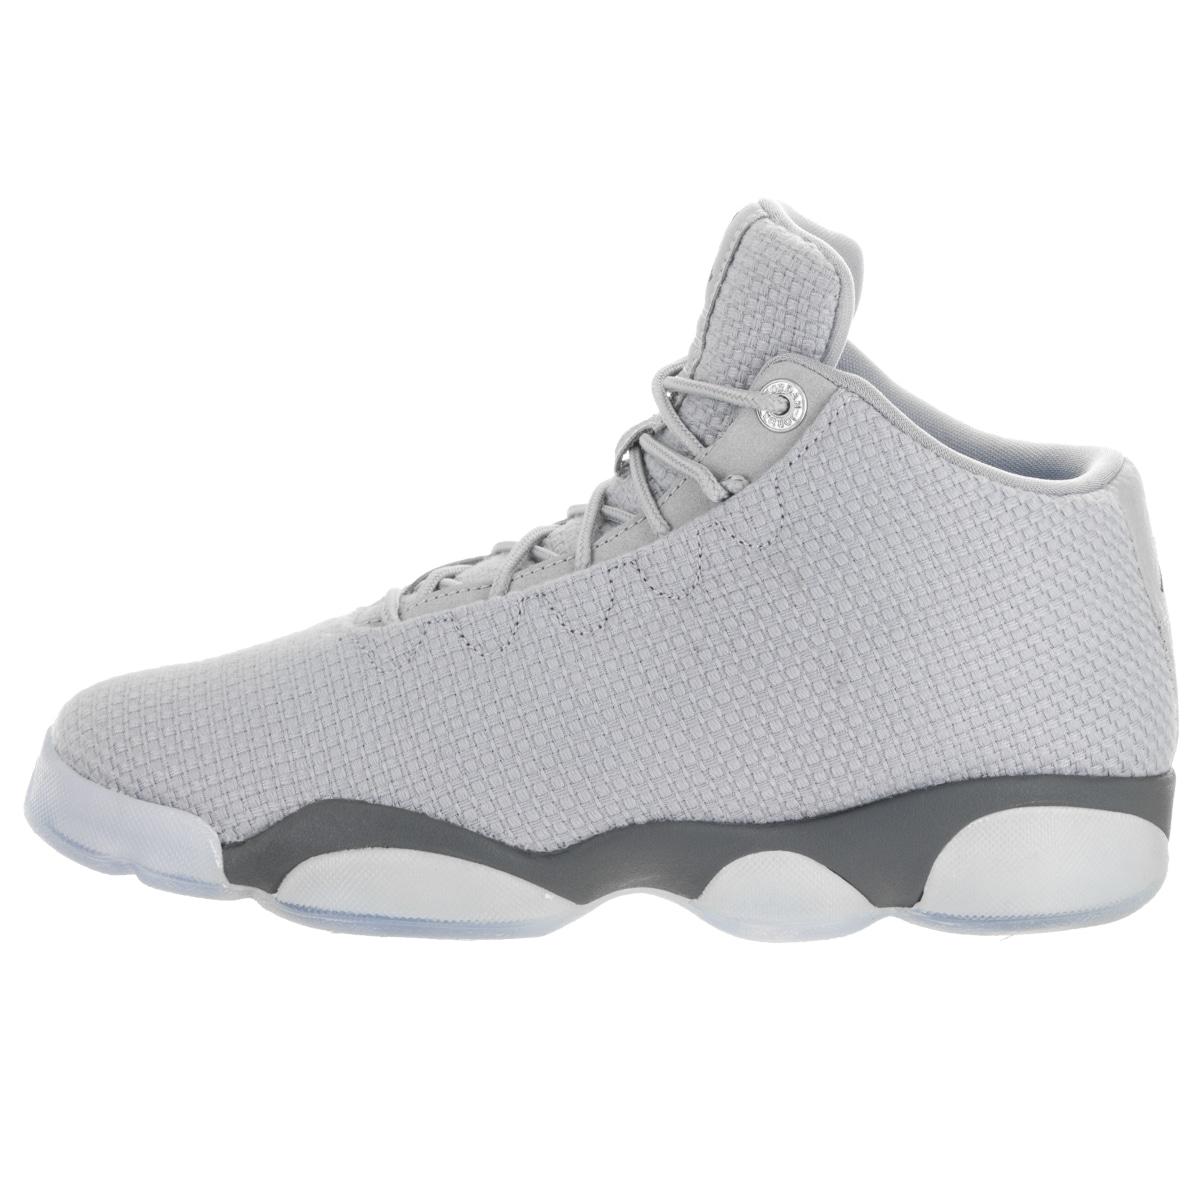 57d3505daa5287 Shop Nike Jordan Kids  Jordan Horizon Low Bg Basketball Shoes - Free  Shipping Today - Overstock - 13518902